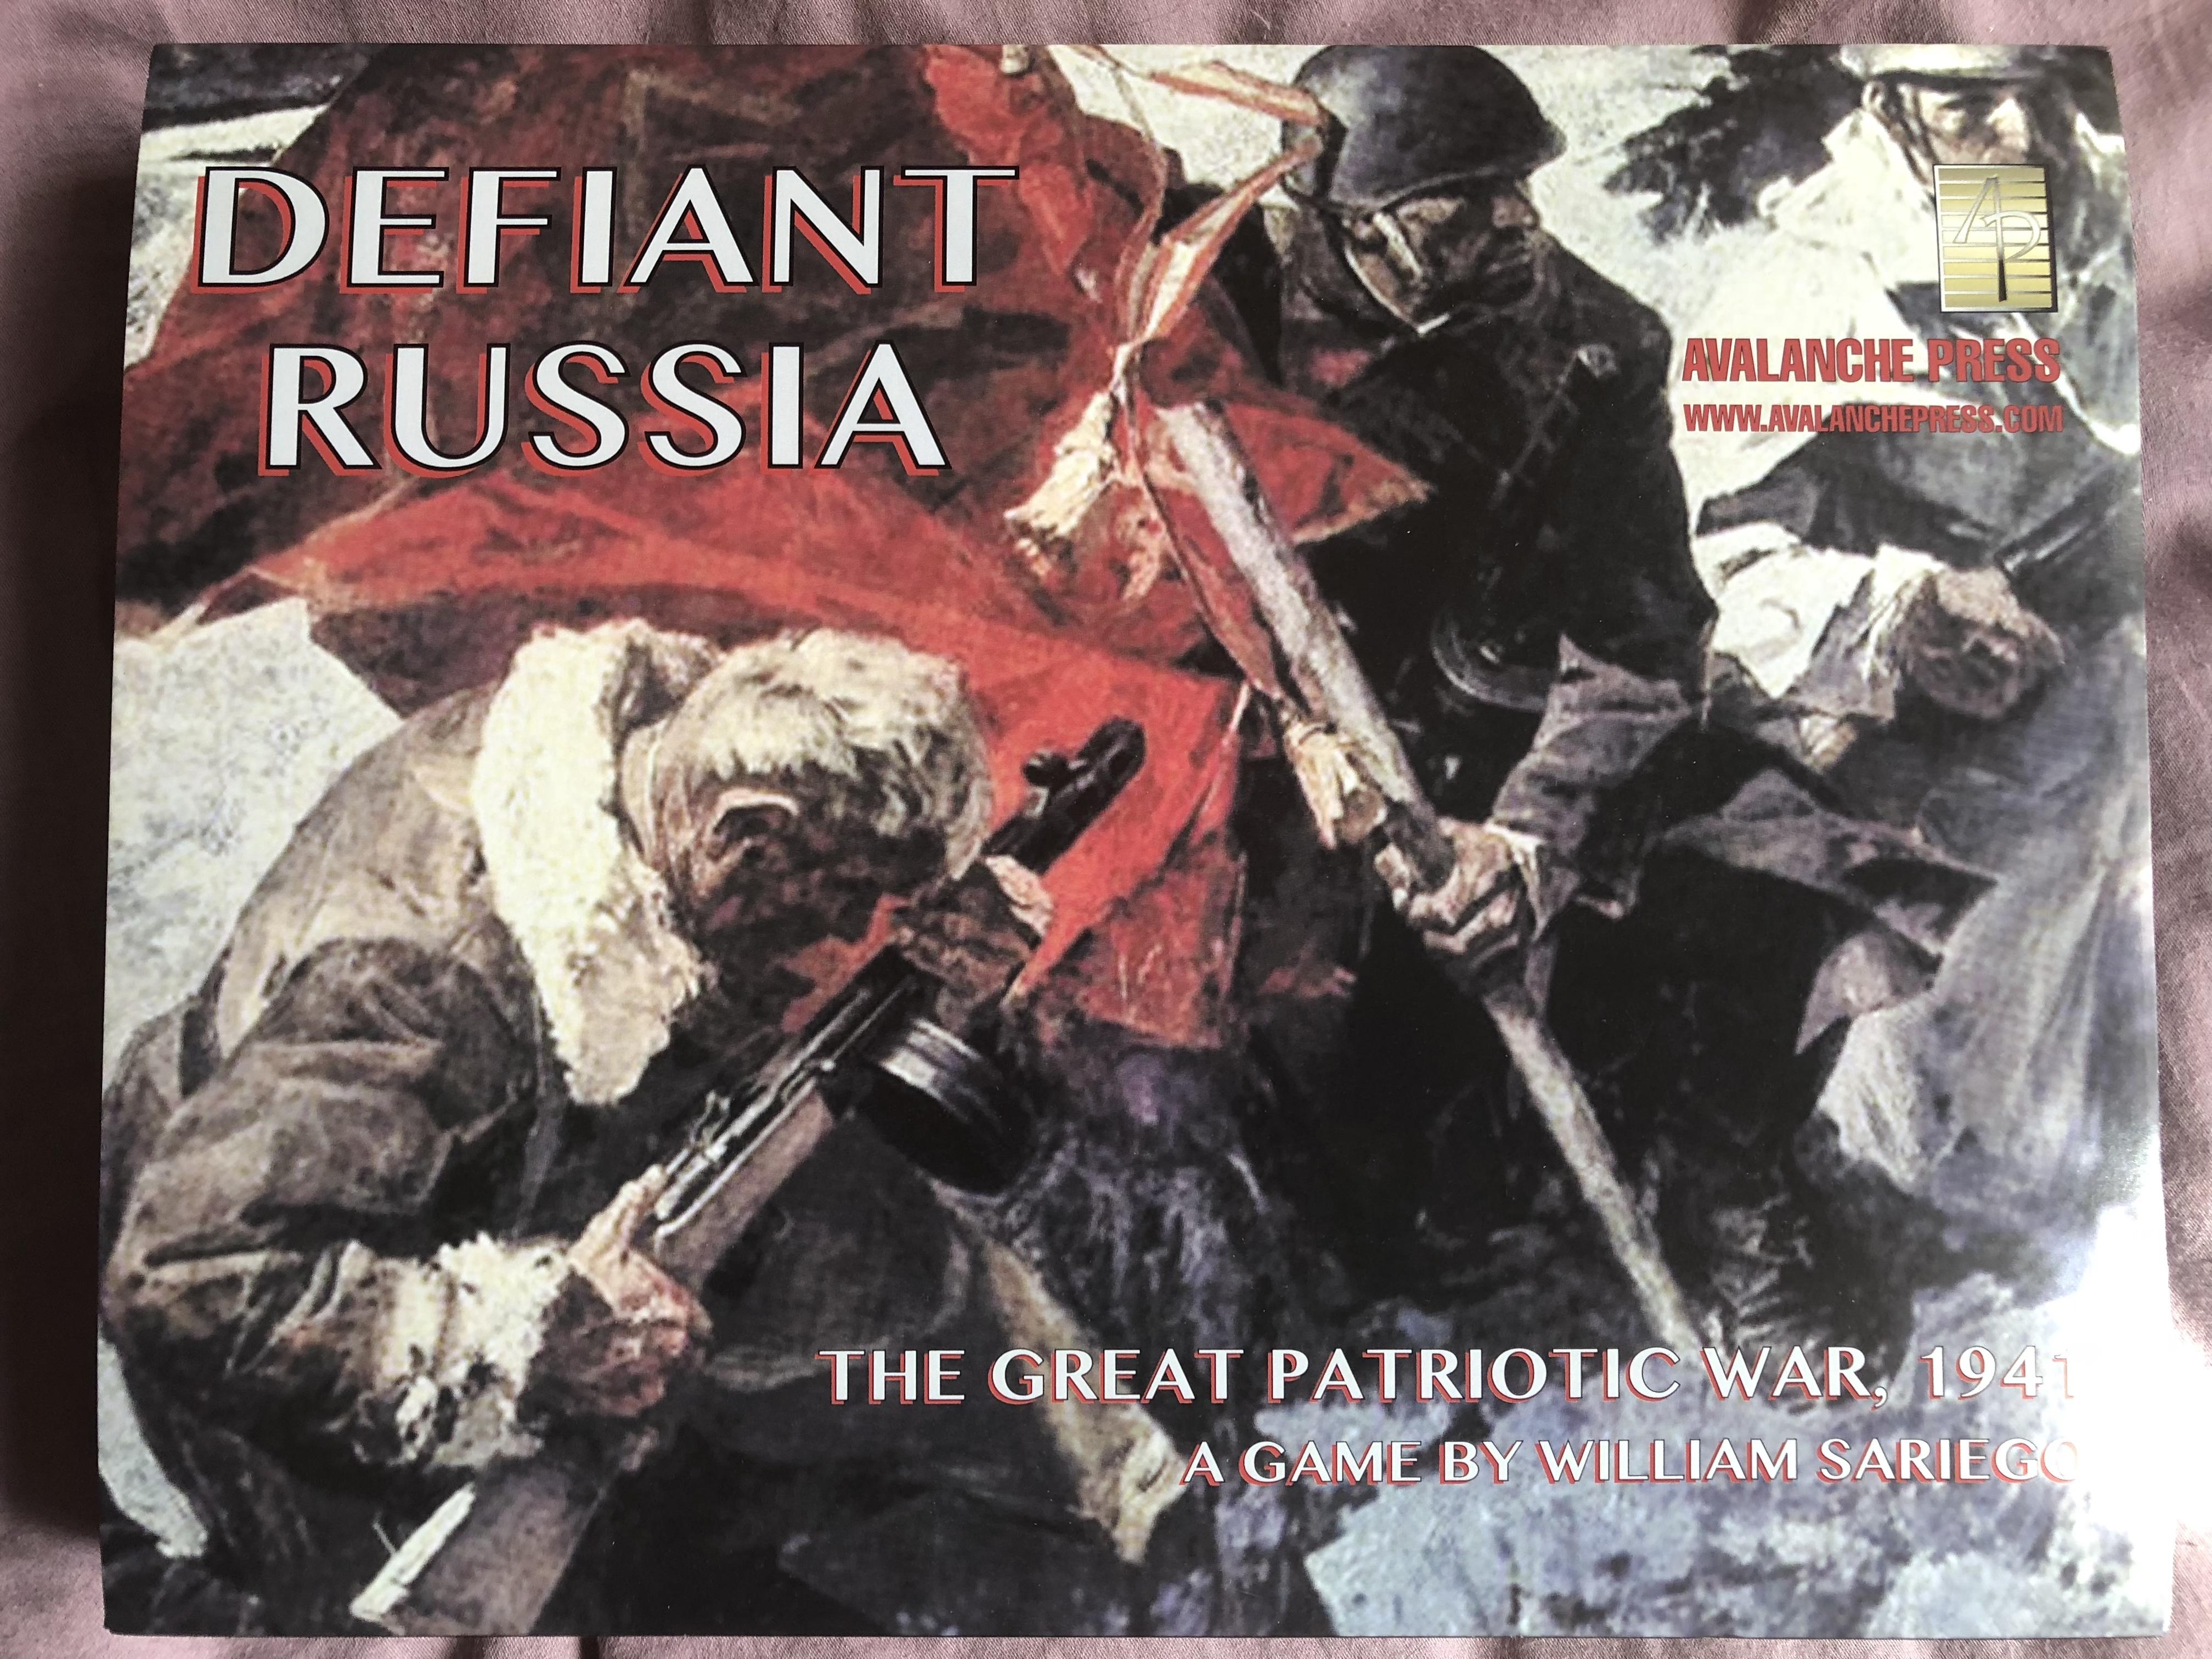 Defiant Russia